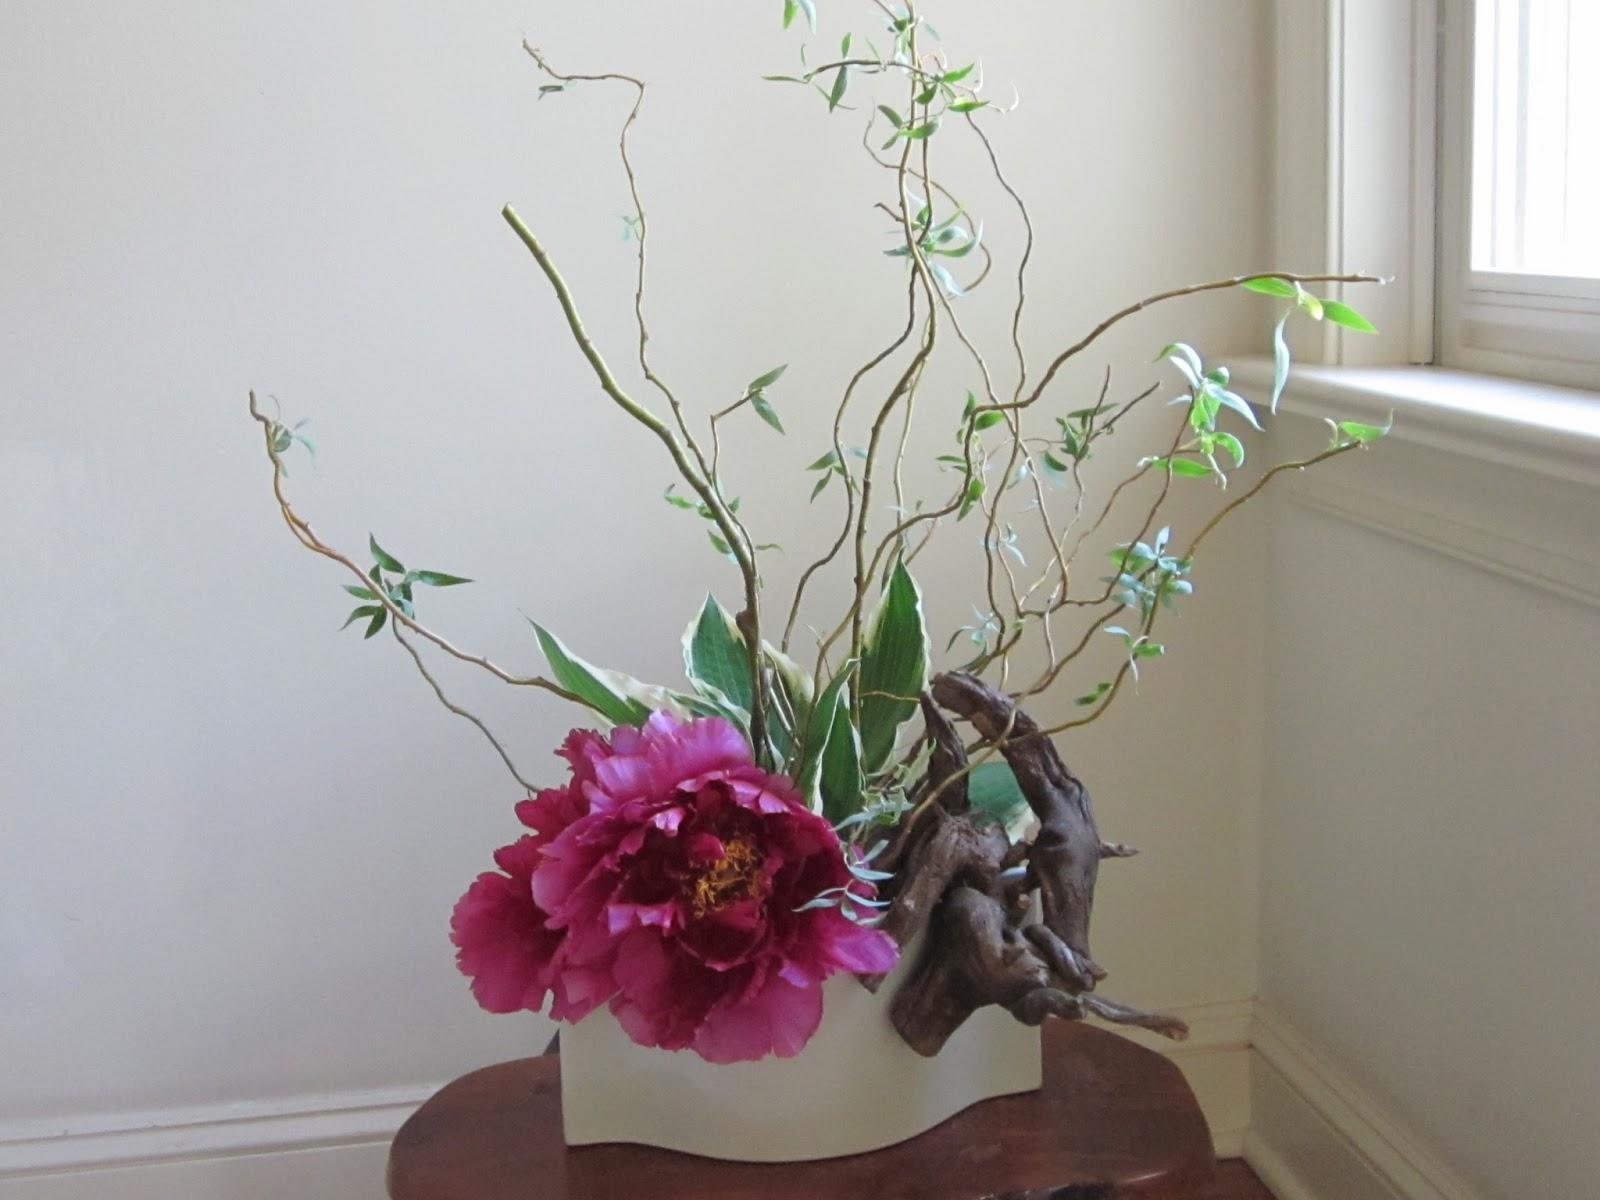 Orchids And Ikebana Peony Arrangement Mass And Line 3